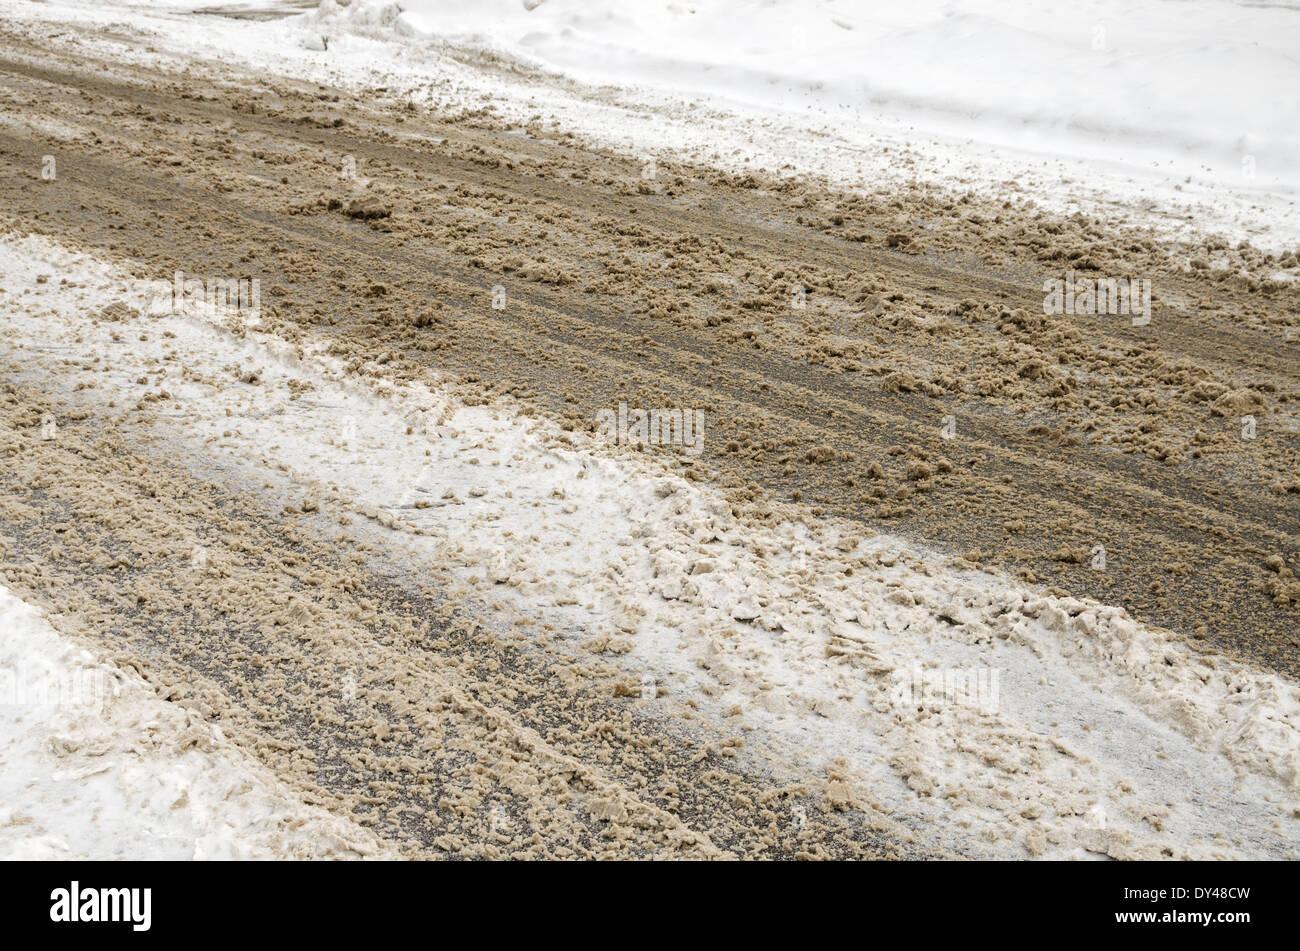 slushy winter road with hazardous driving conditions - Stock Image